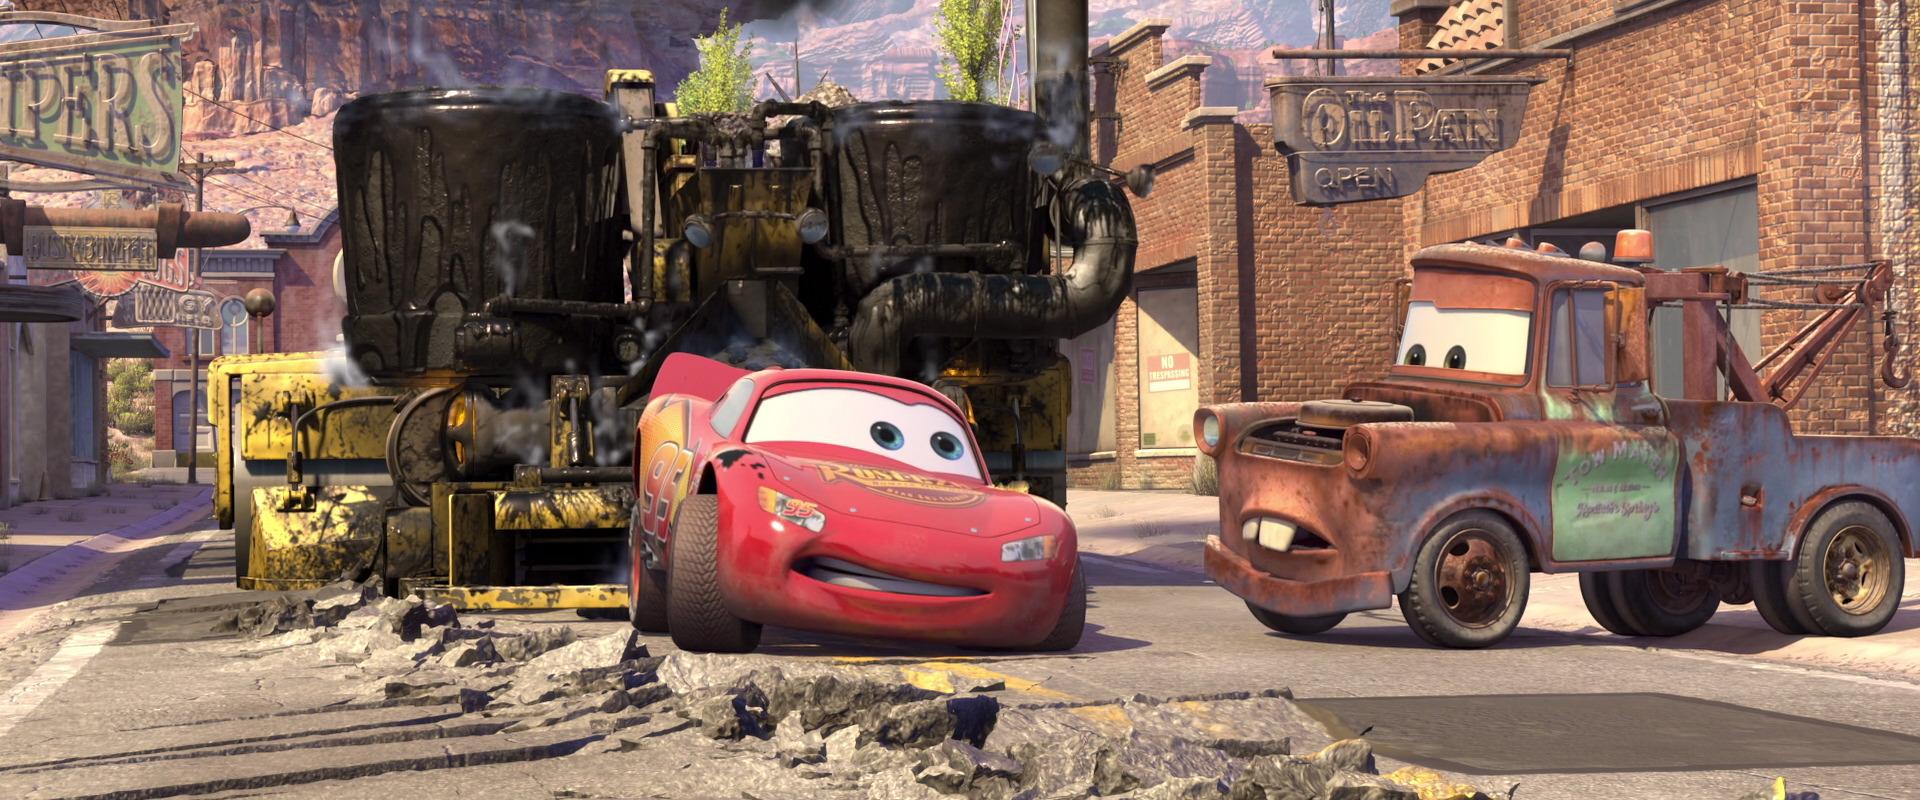 Image - Cars-disneyscreencaps.com-4809.jpg | Disney Wiki ...